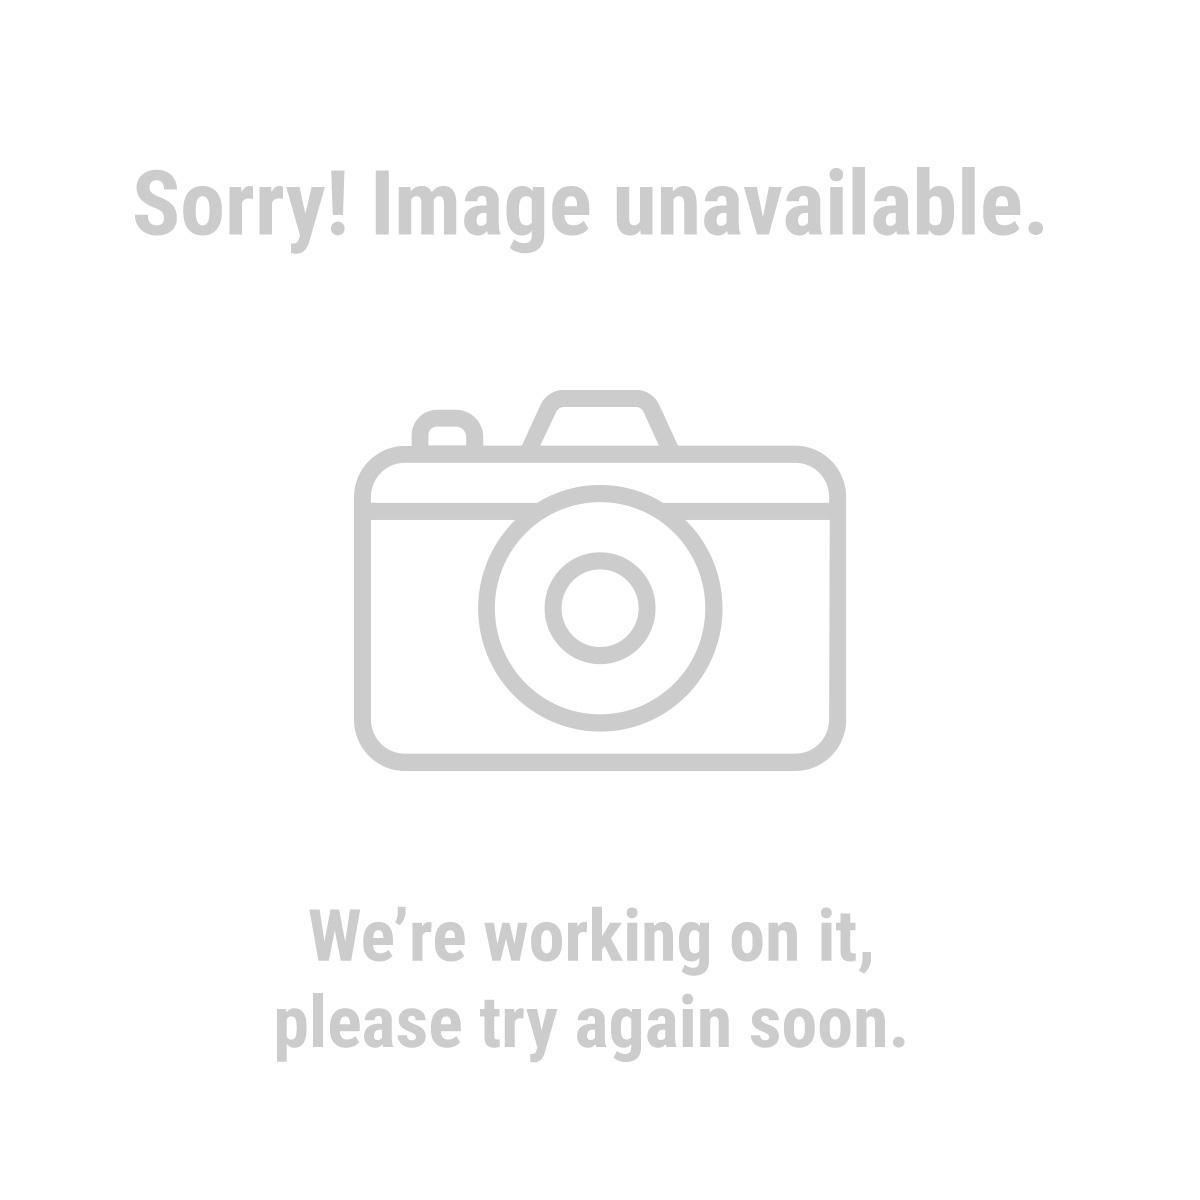 Pittsburgh® Automotive 63109 12V 150 PSI Portable Inflator